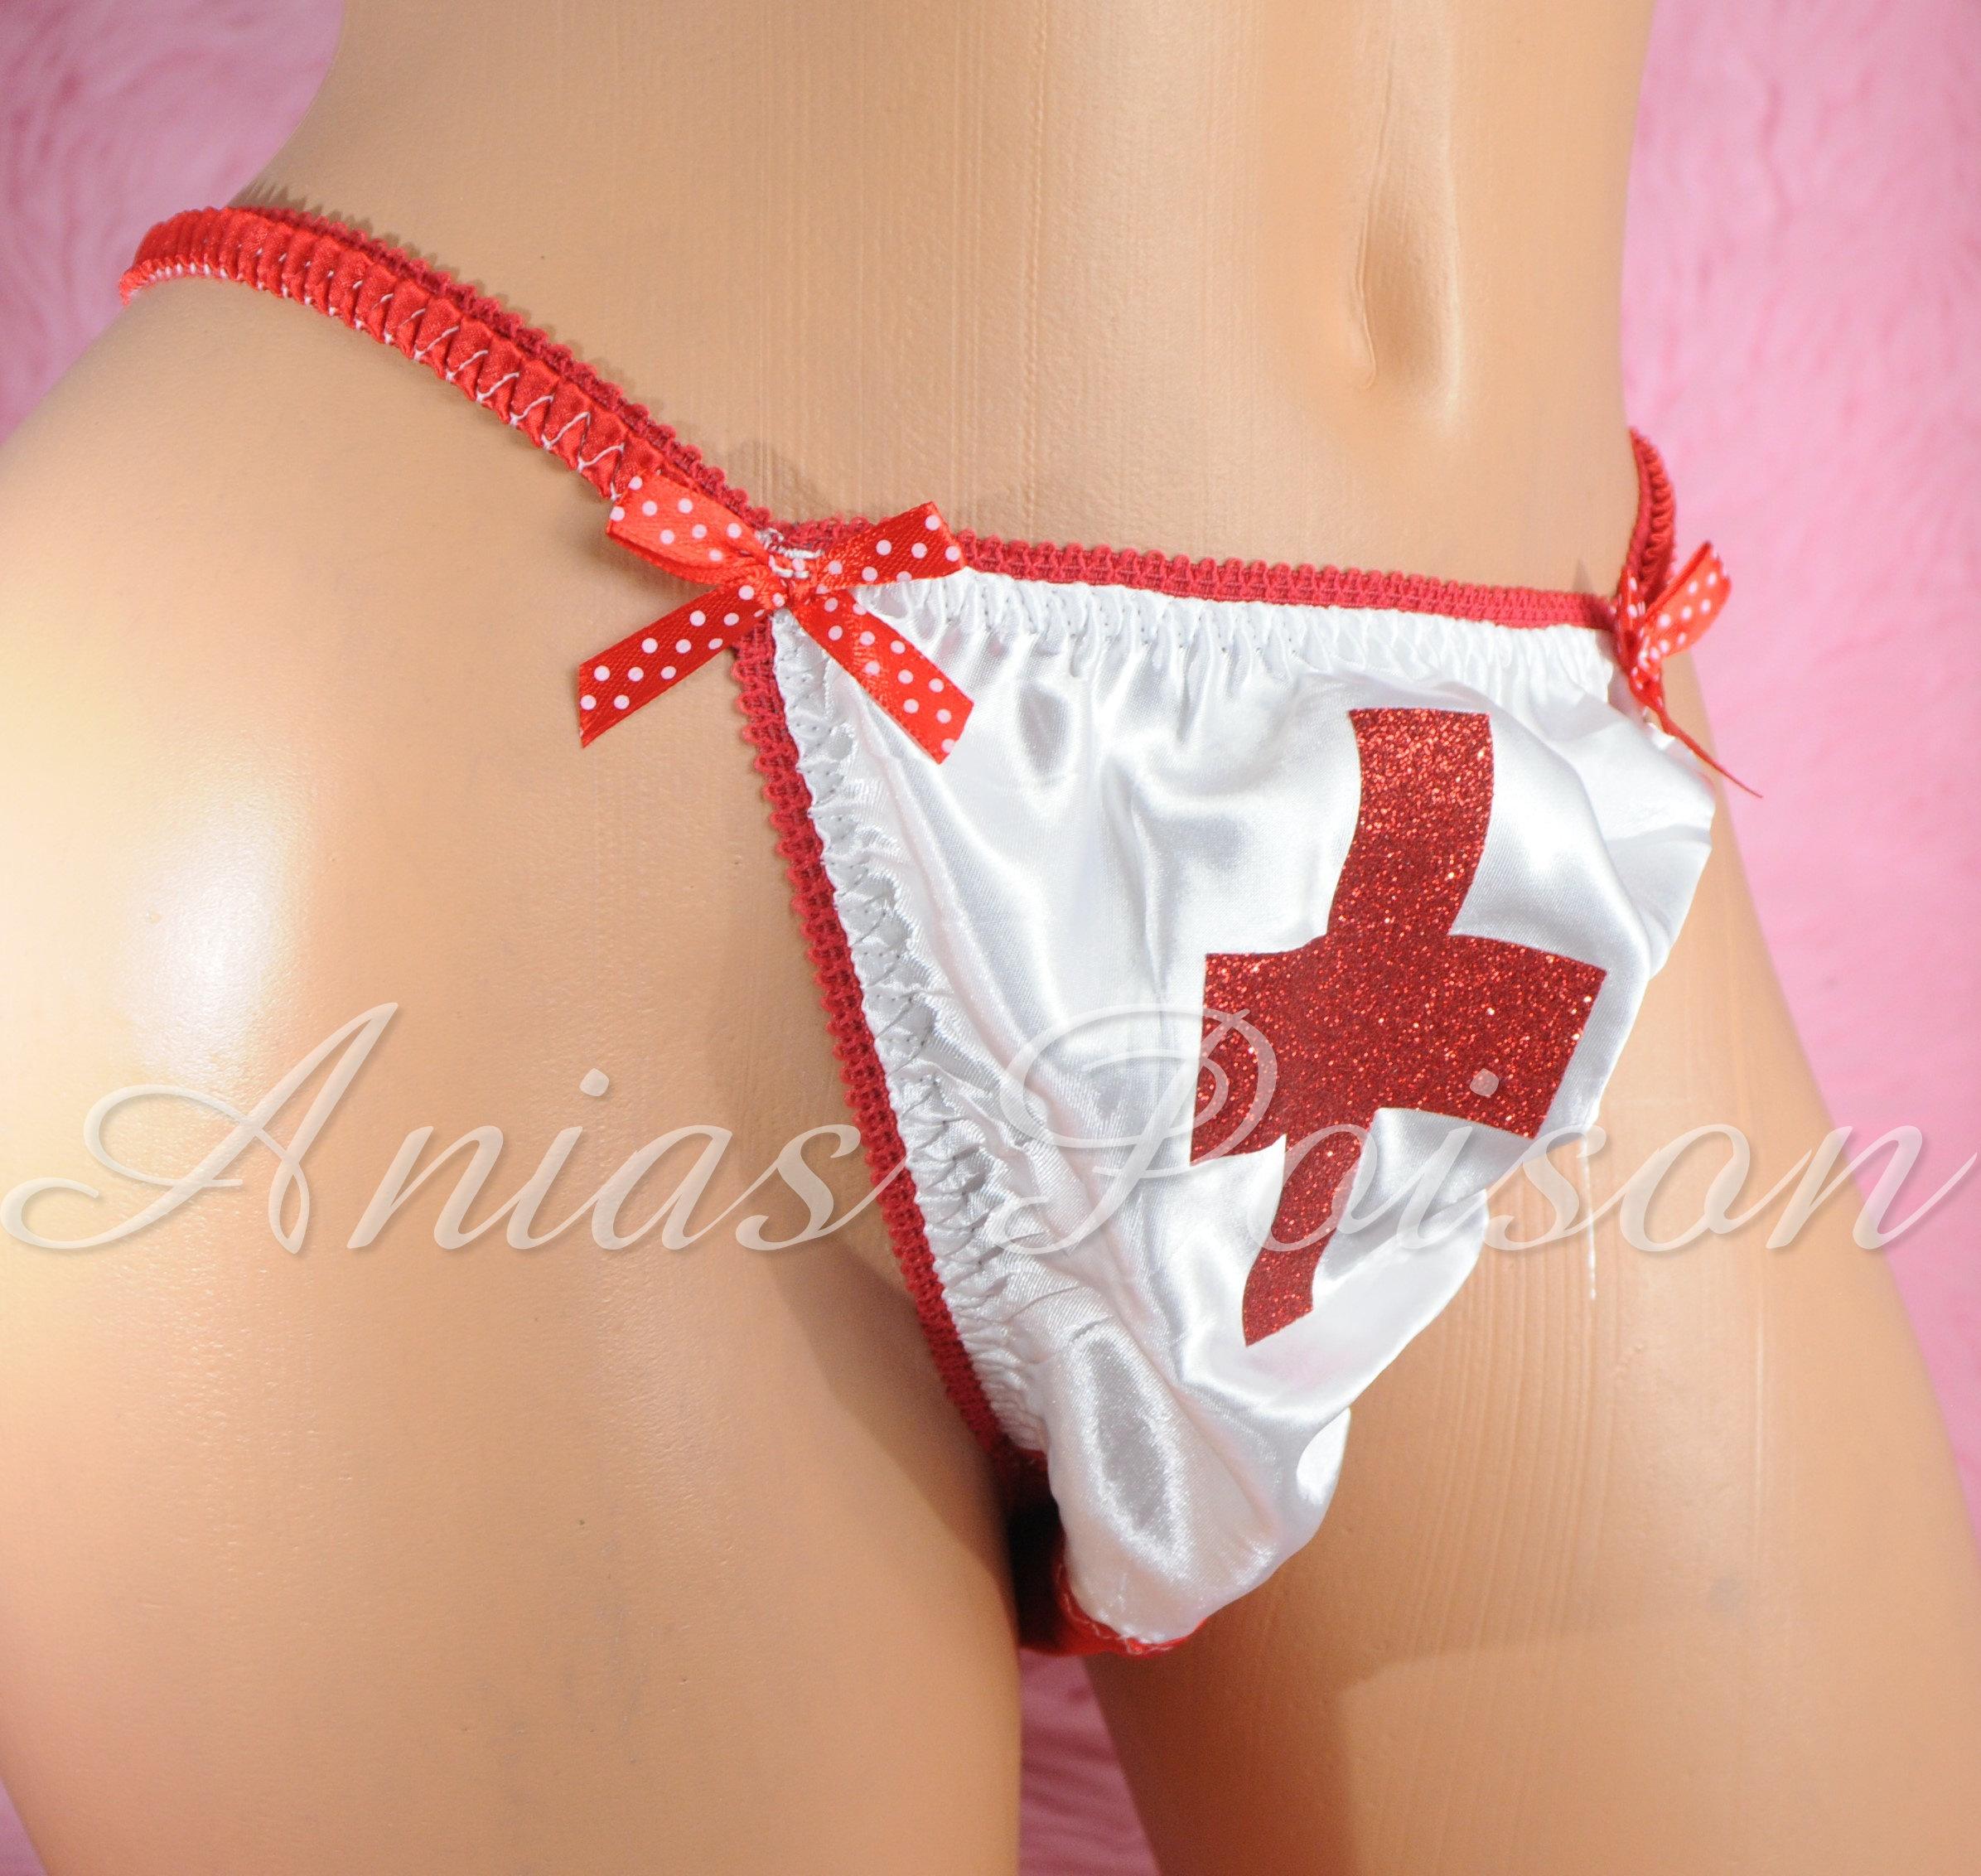 Ania's Poison MANties S - XXL shiny Rare 100% polyester string bikini sissy mens underwear panties